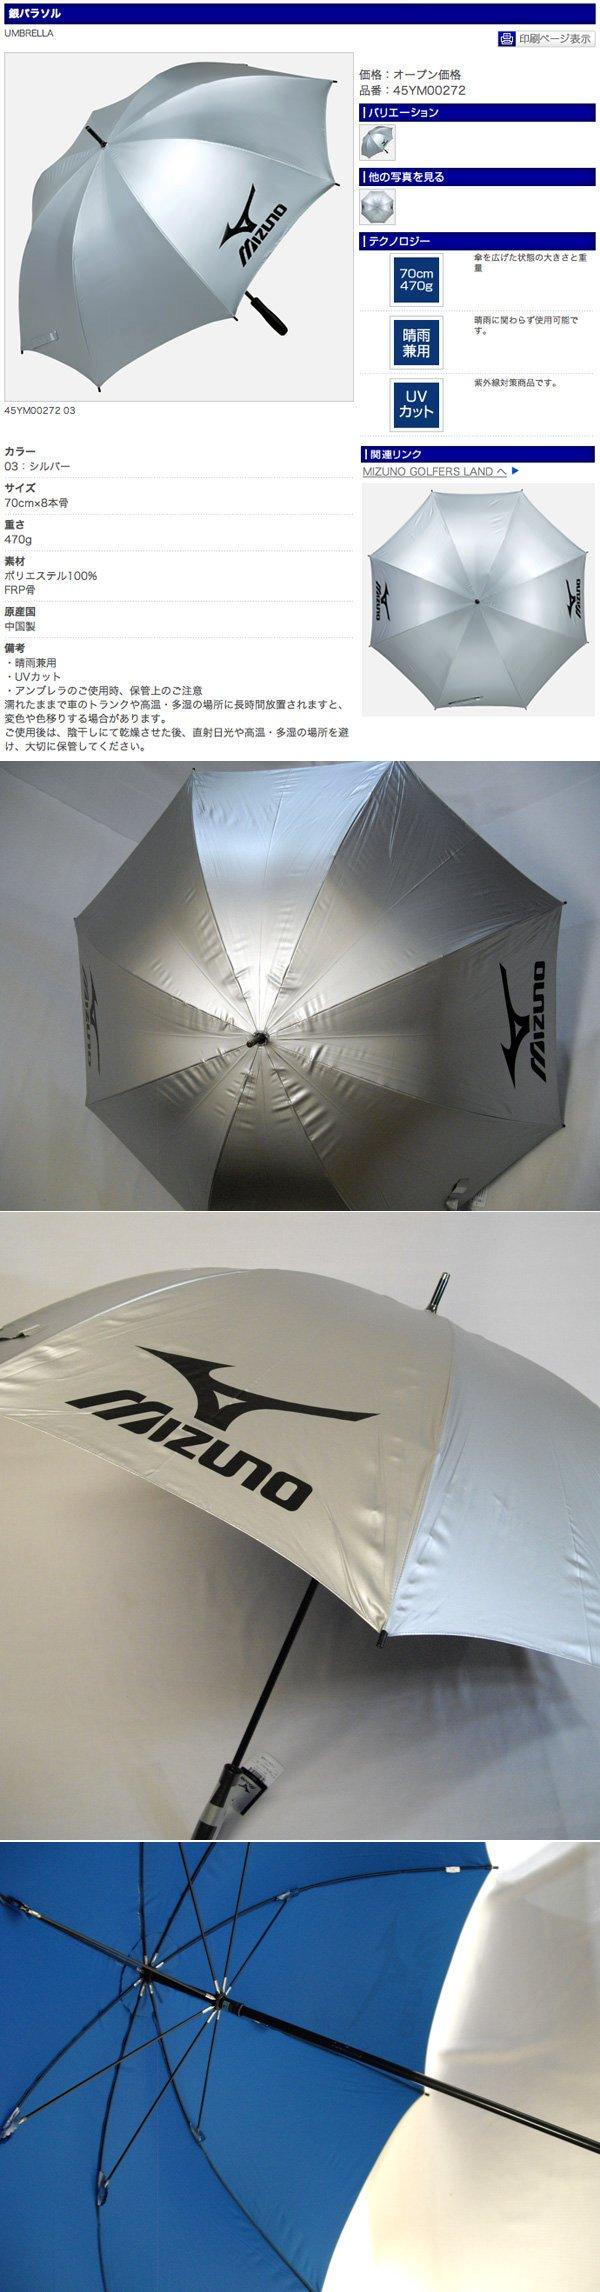 MIZUNO Uv-cut Umbrella JAPAN